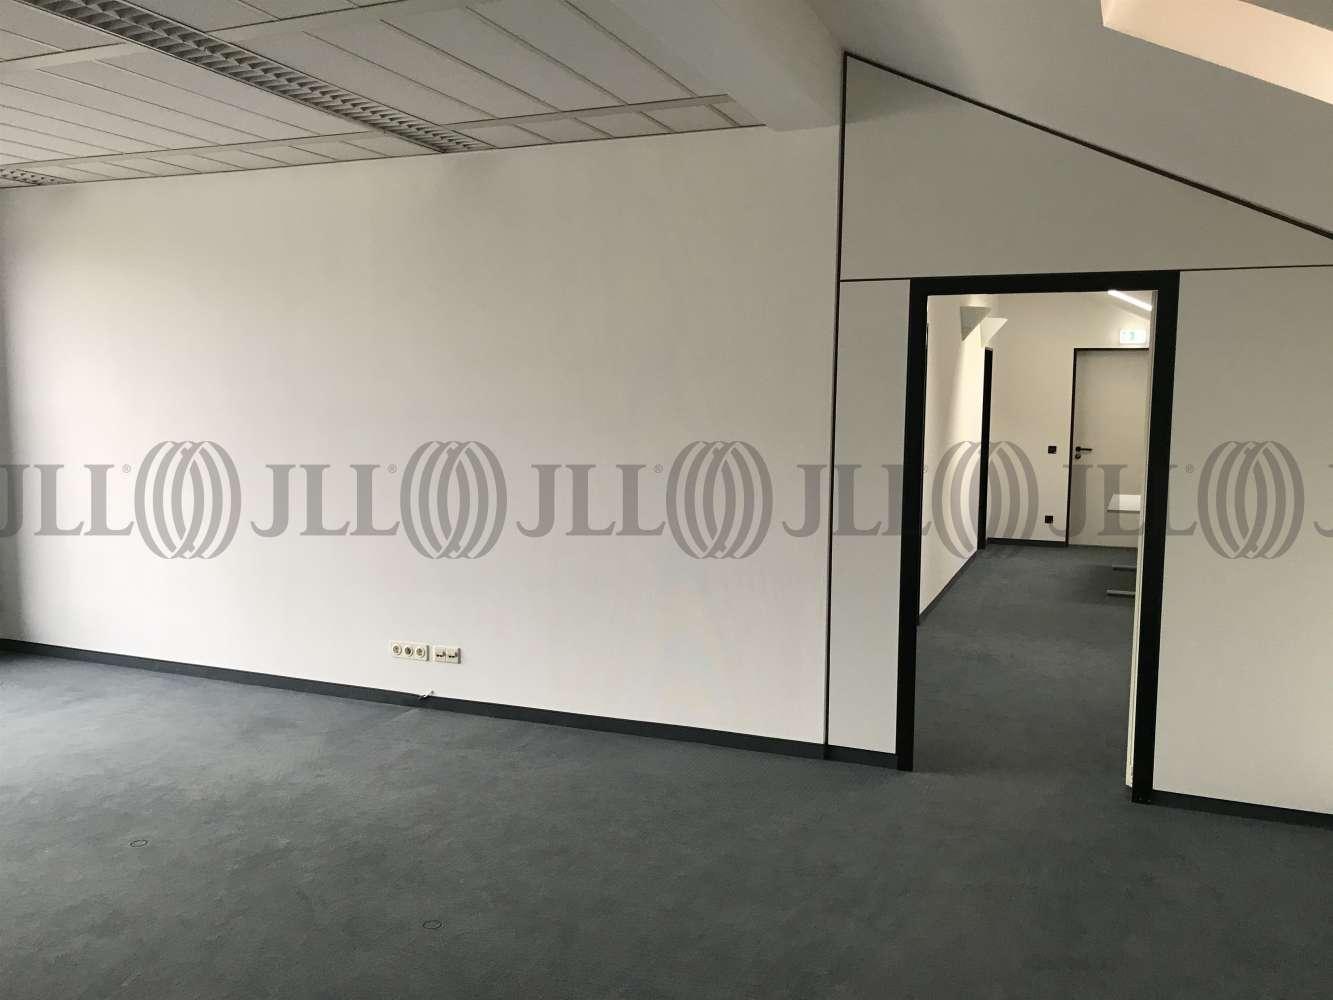 Büros Leinfelden-echterdingen, 70771 - Büro - Leinfelden-Echterdingen, Echterdingen - S0005 - 10909936